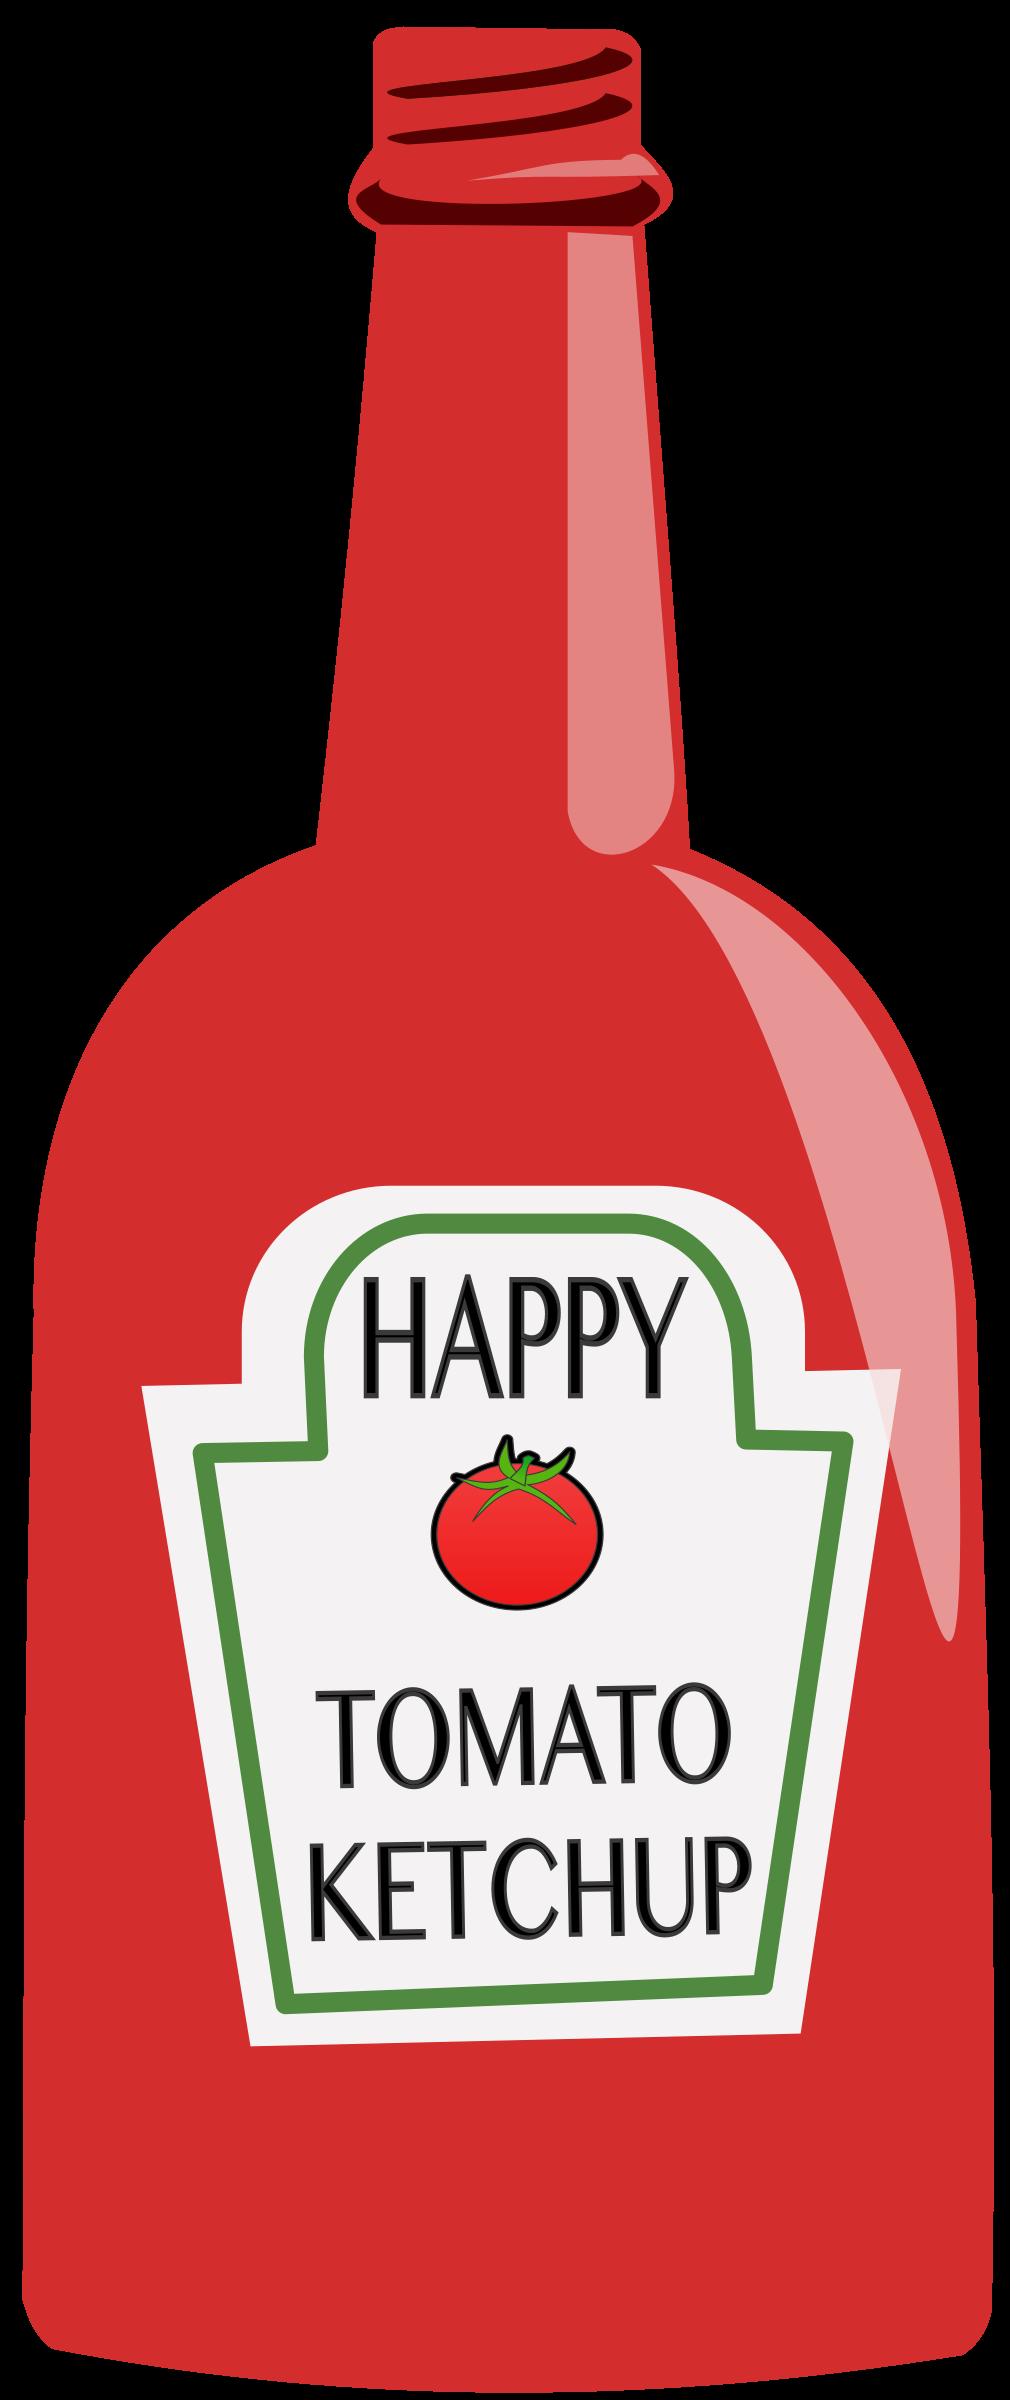 clip art download Ketchup clipart png. Tomato big image